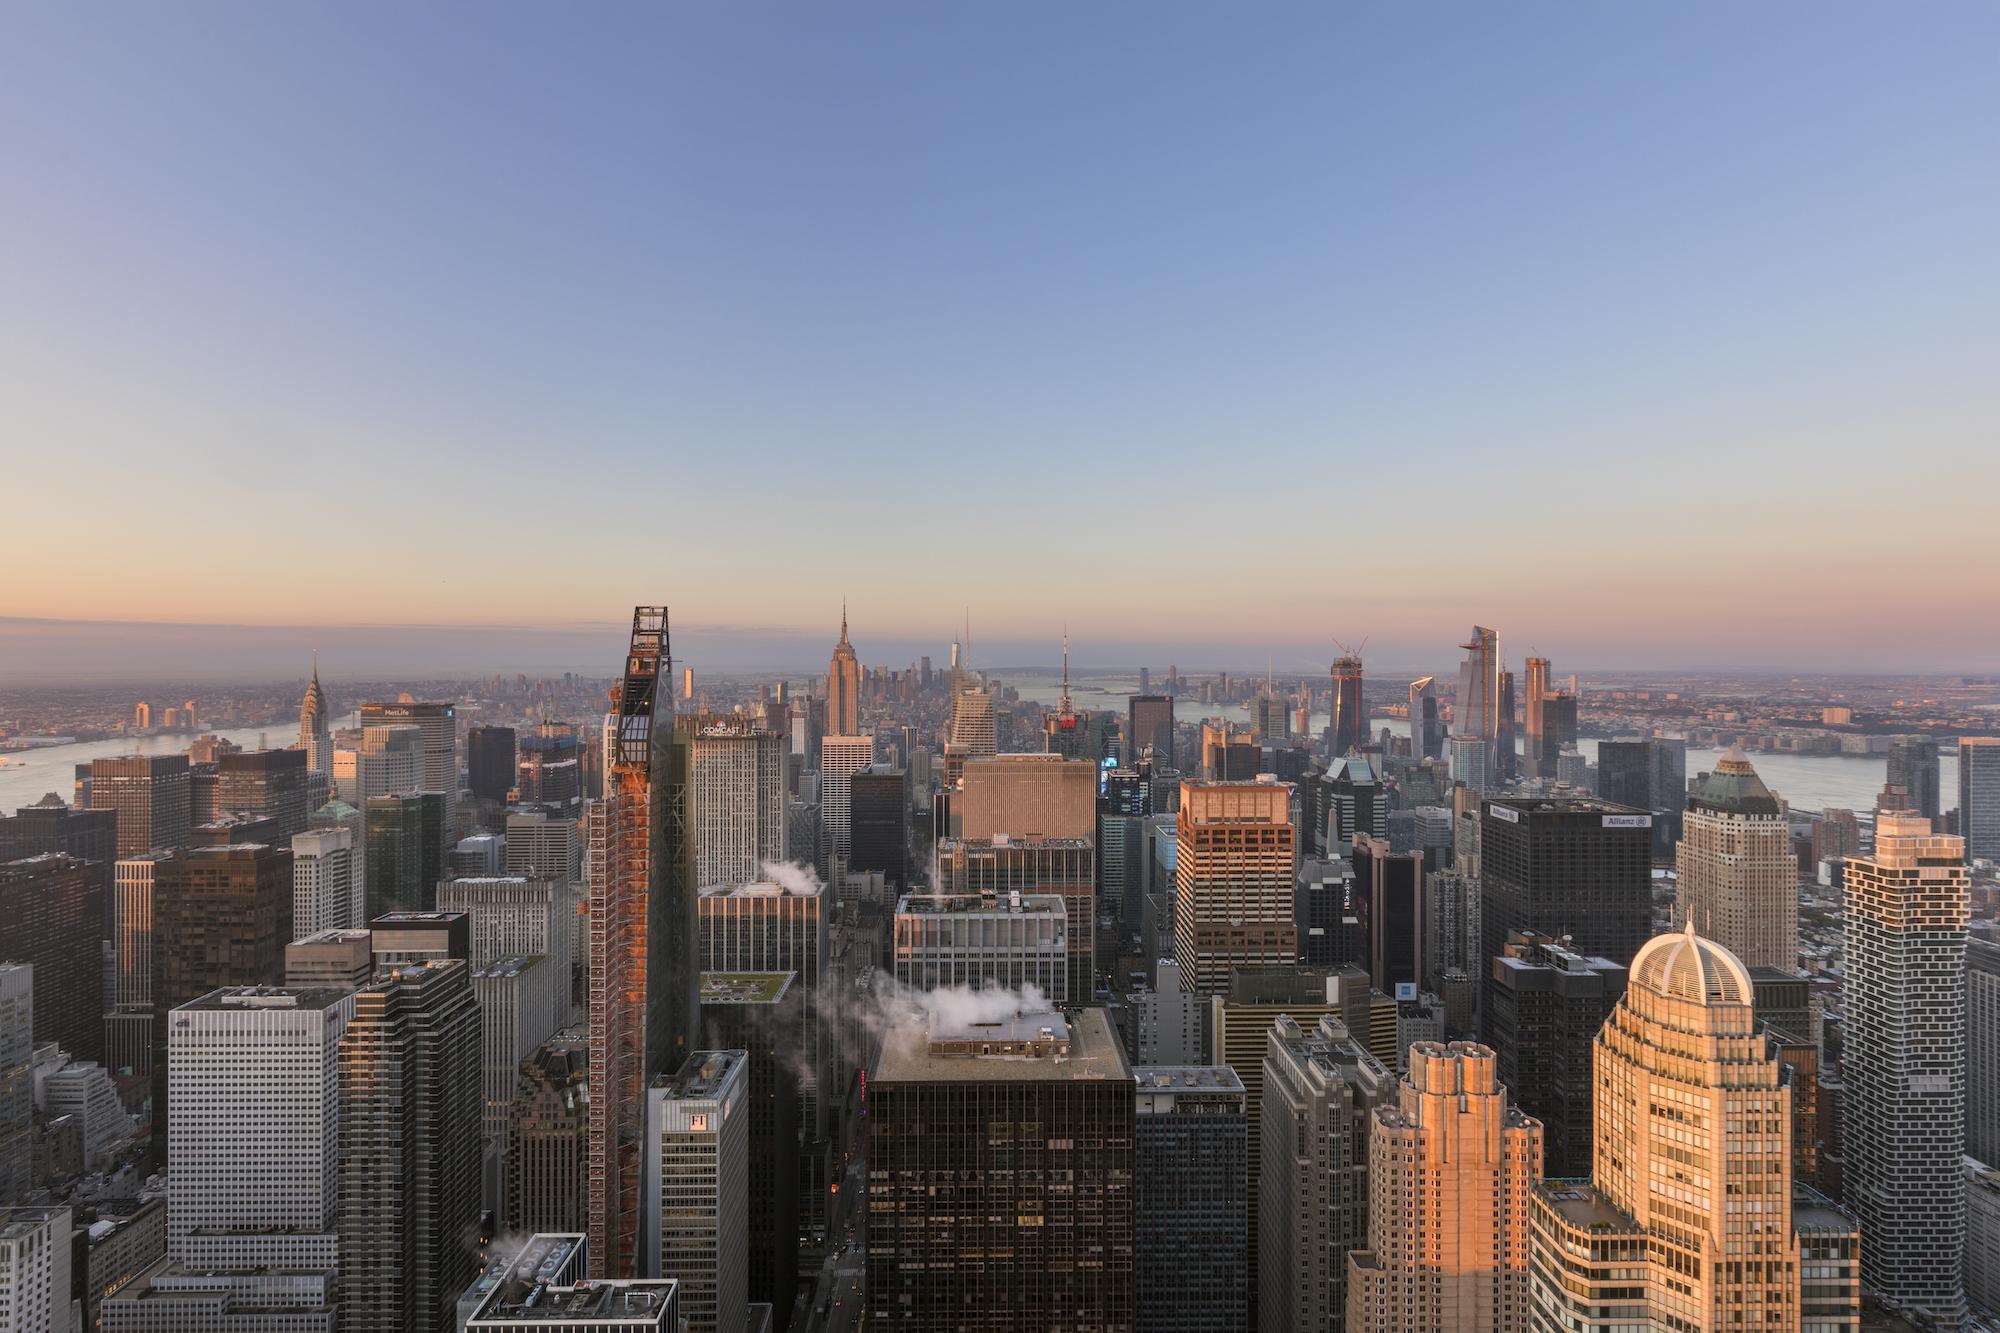 111 West 57th Street, supertall, billionaires row